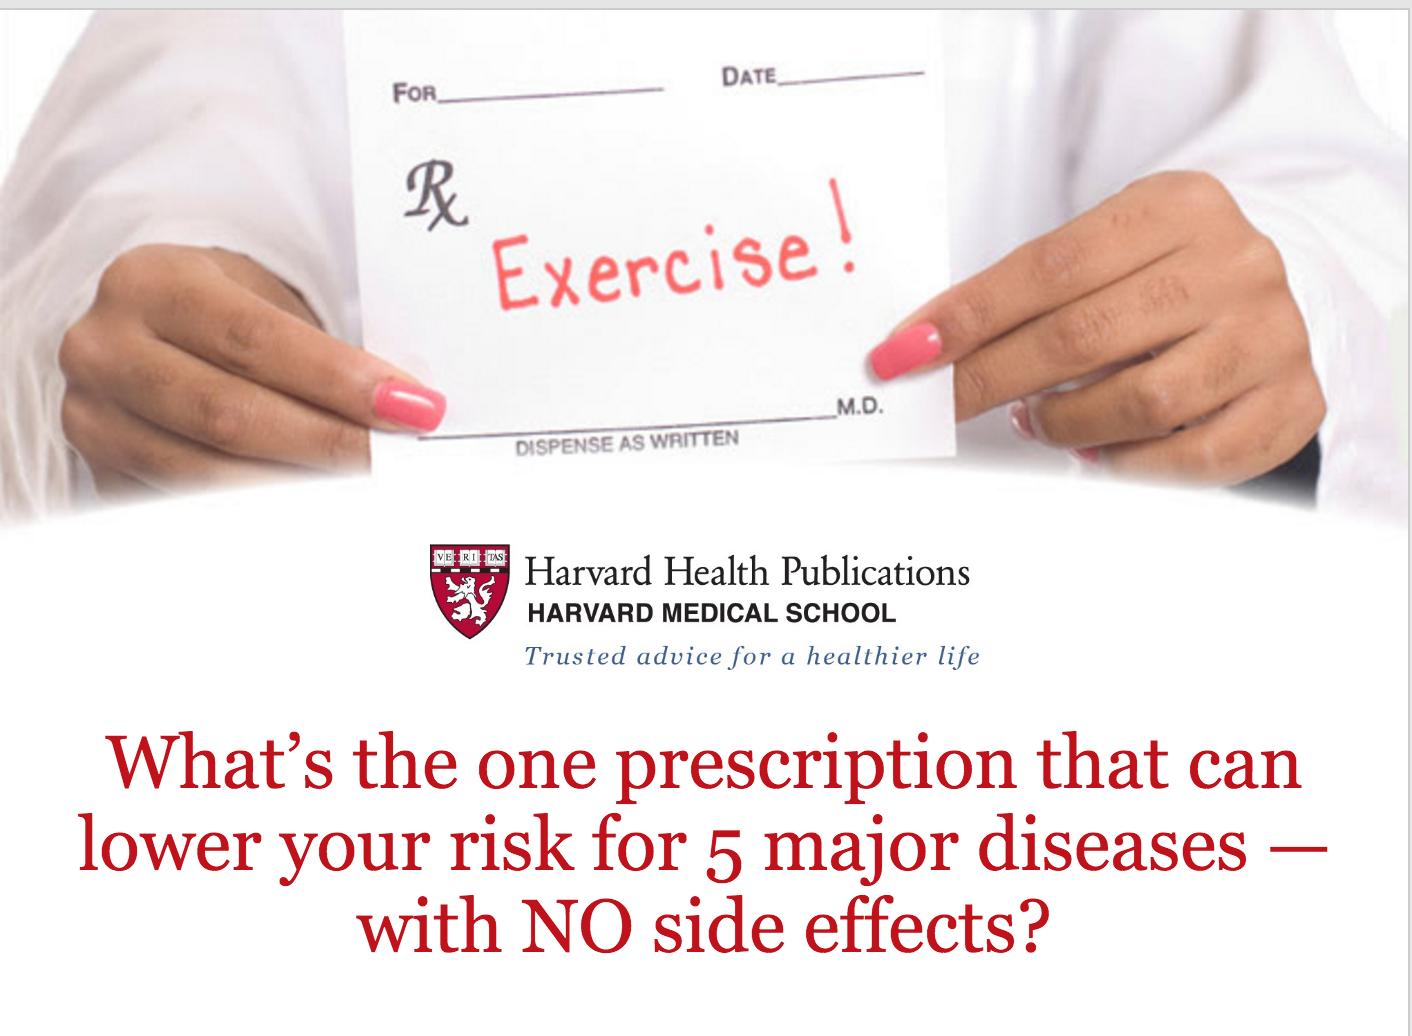 Https Mail Google Com Mail U 0 Inbox 15ae85ea1791d397 Healthy Aging Harvard Health Harvard Medical School